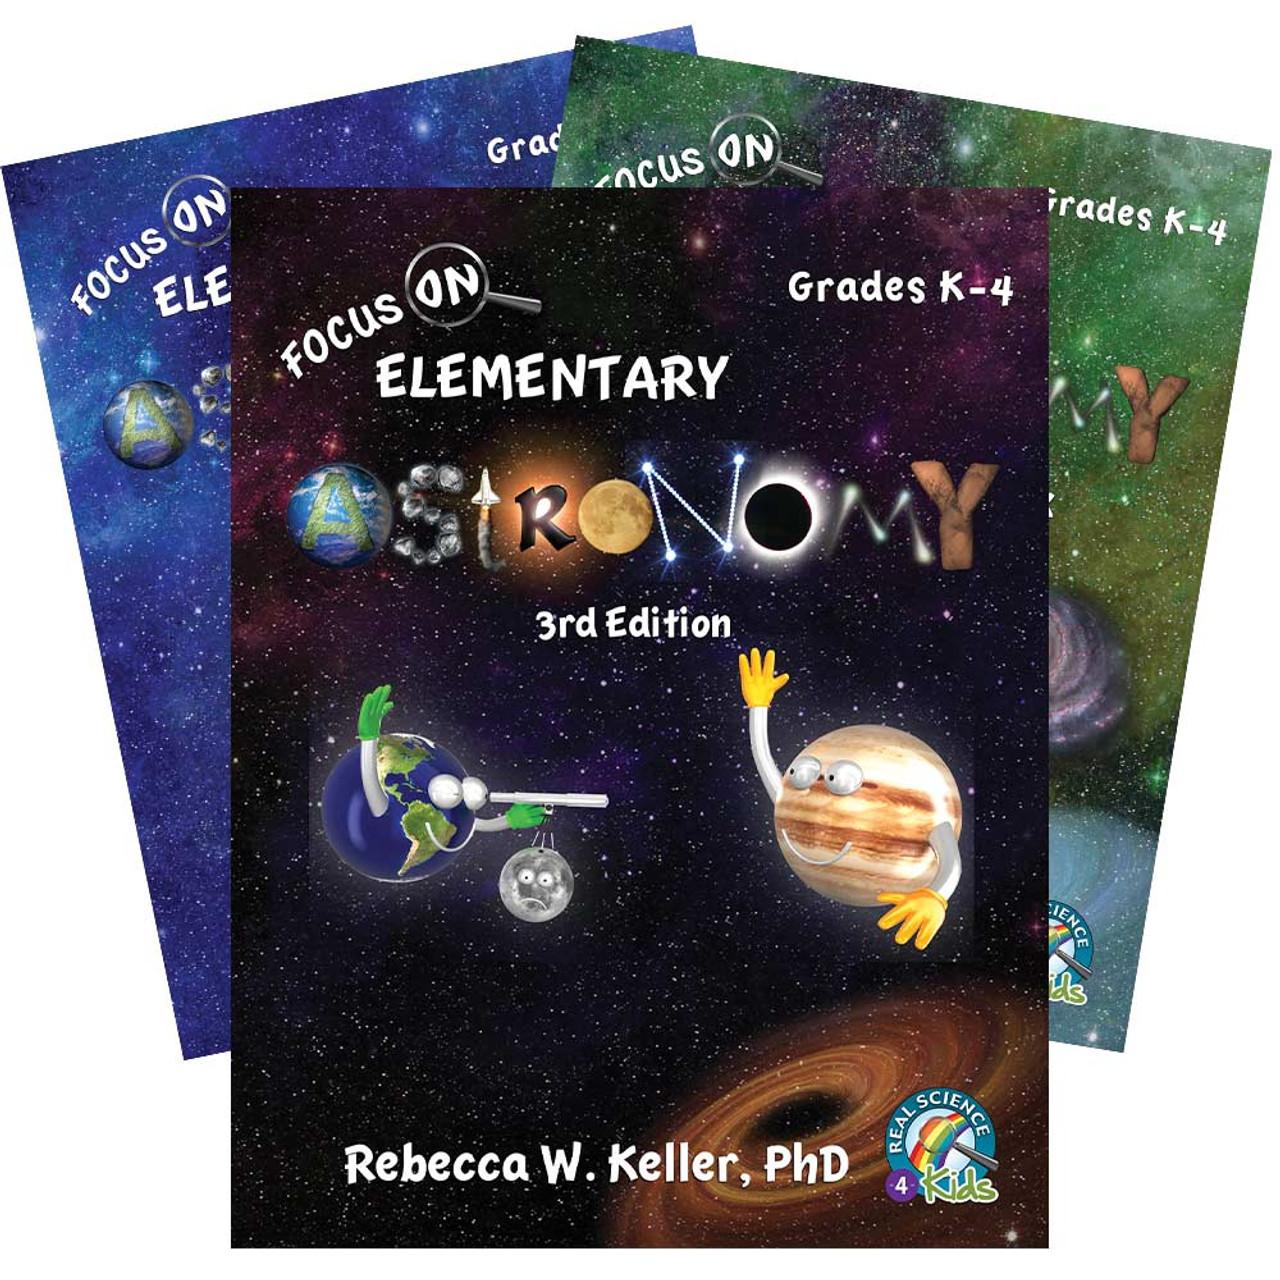 medium resolution of RS4K   Focus On Elementary Astronomy Set